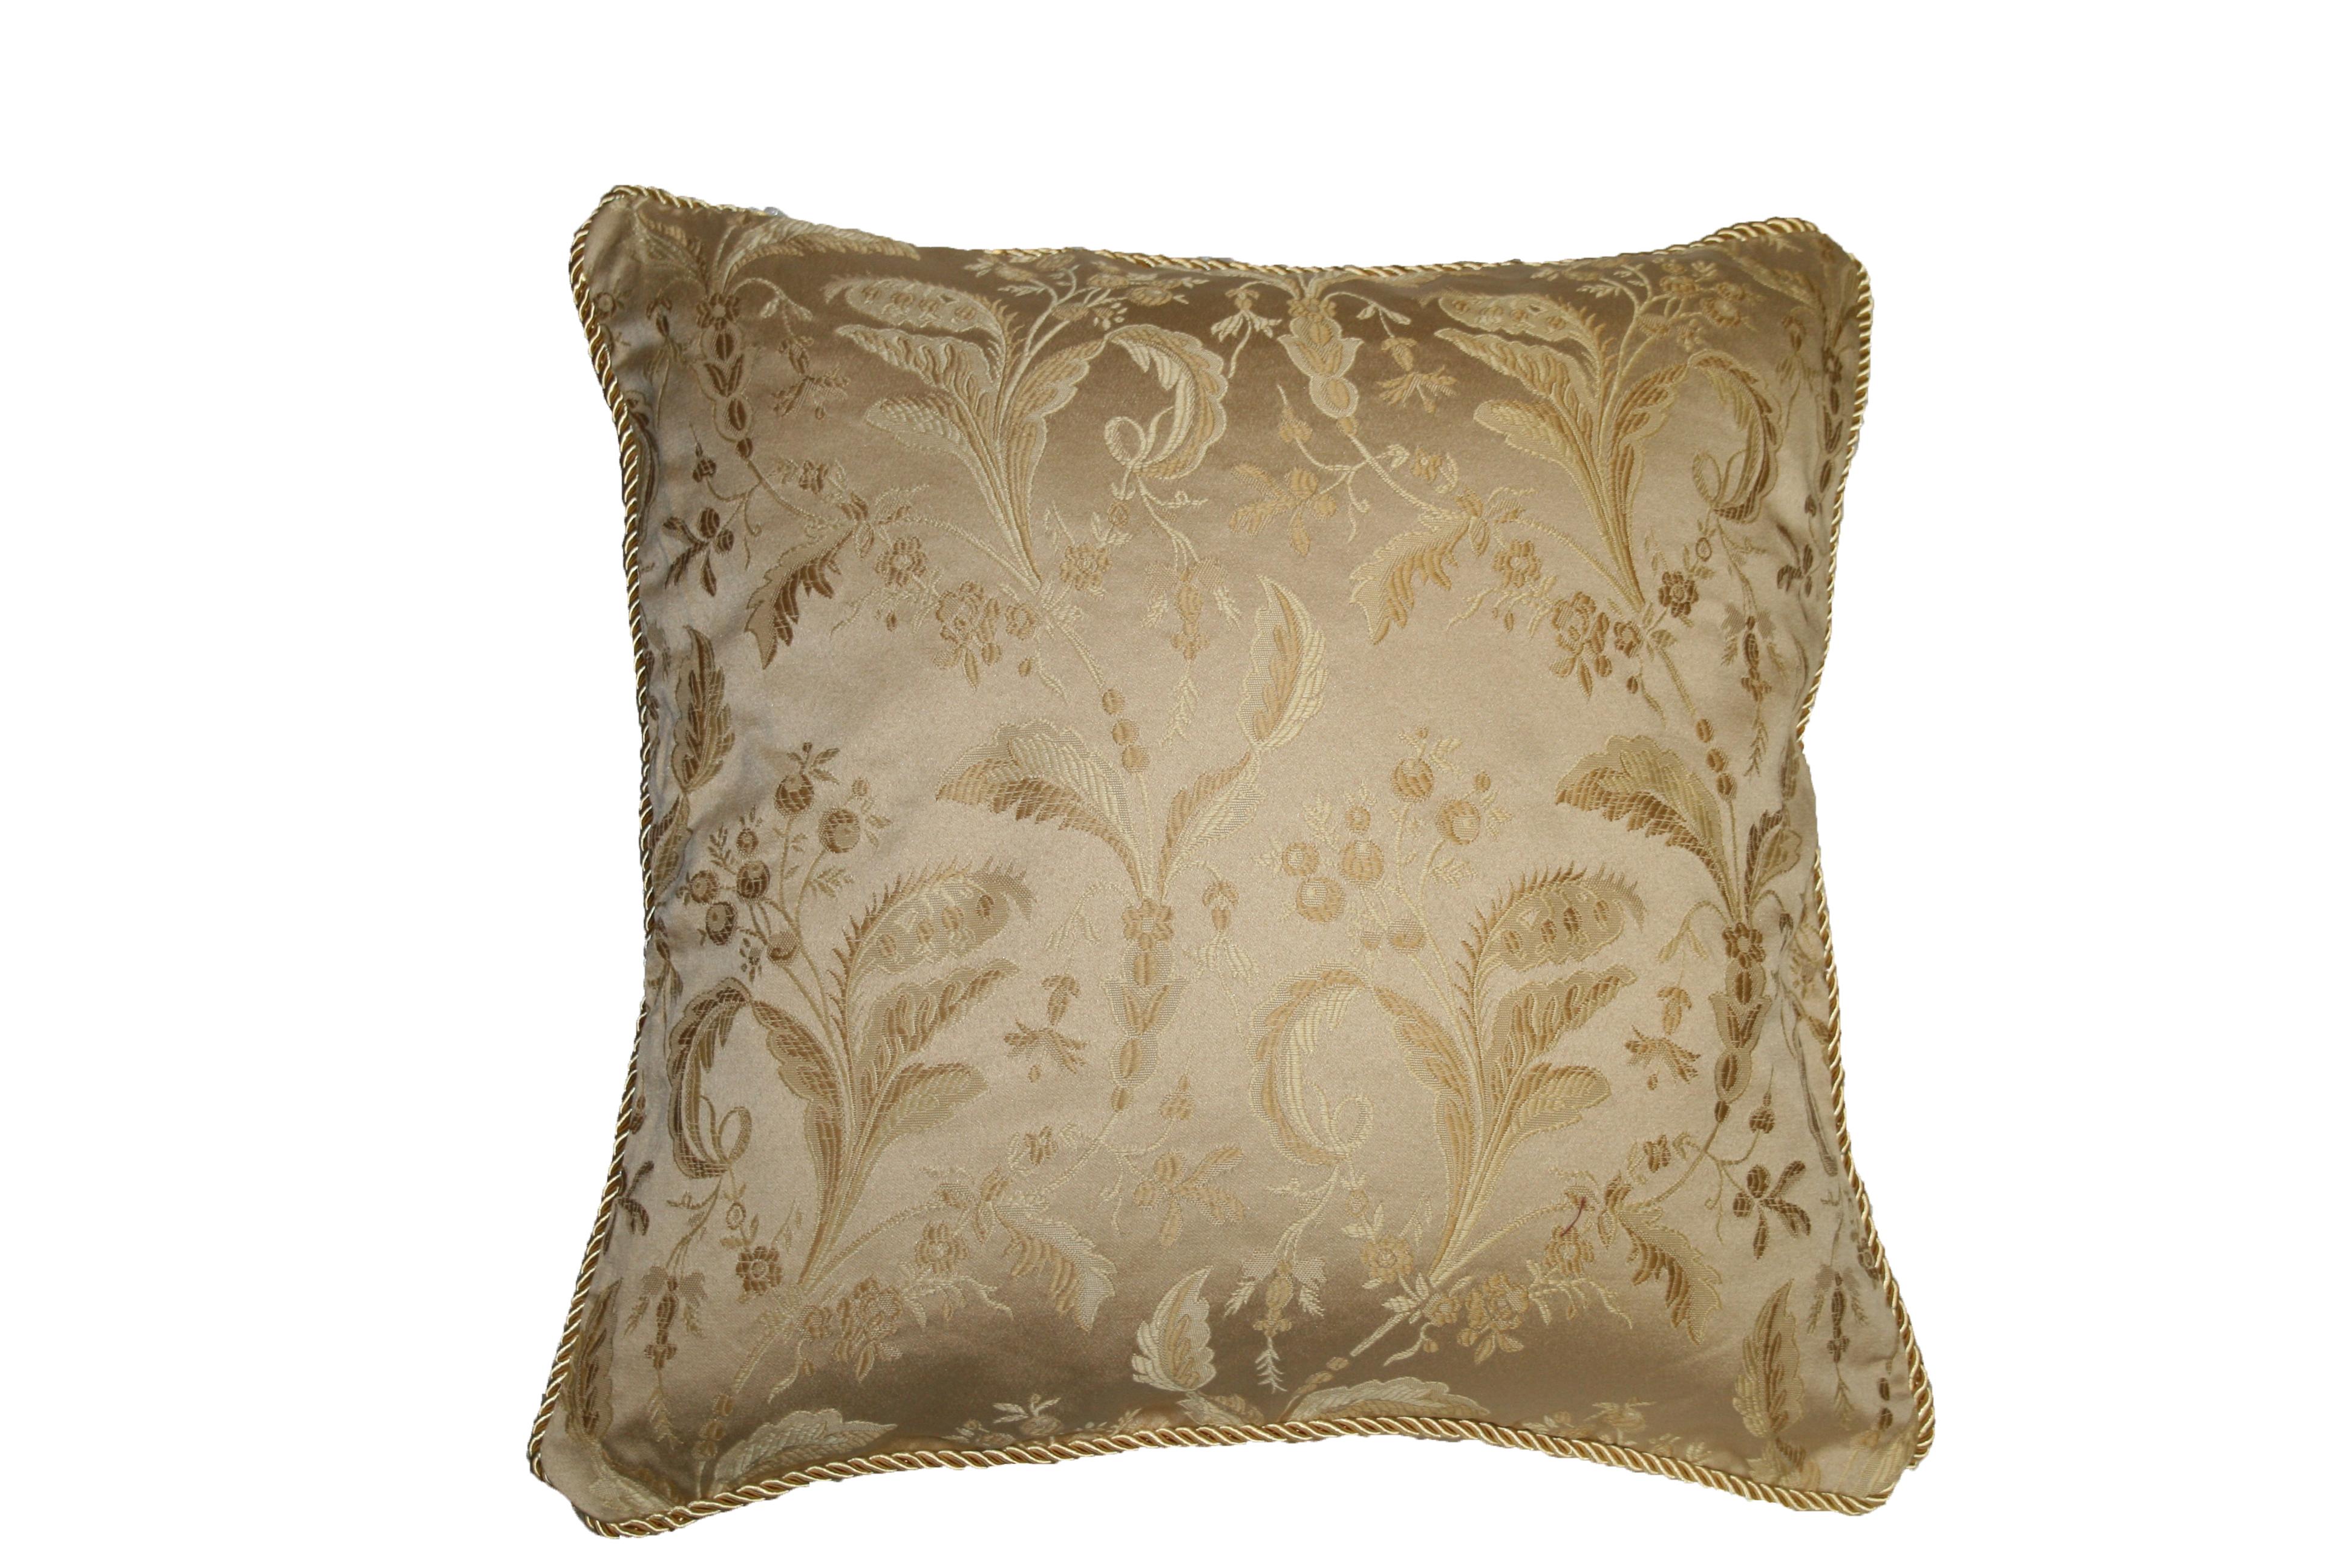 luxury sofa throw pillows upholstery fabric for sofas damask design decorative pillow ebay